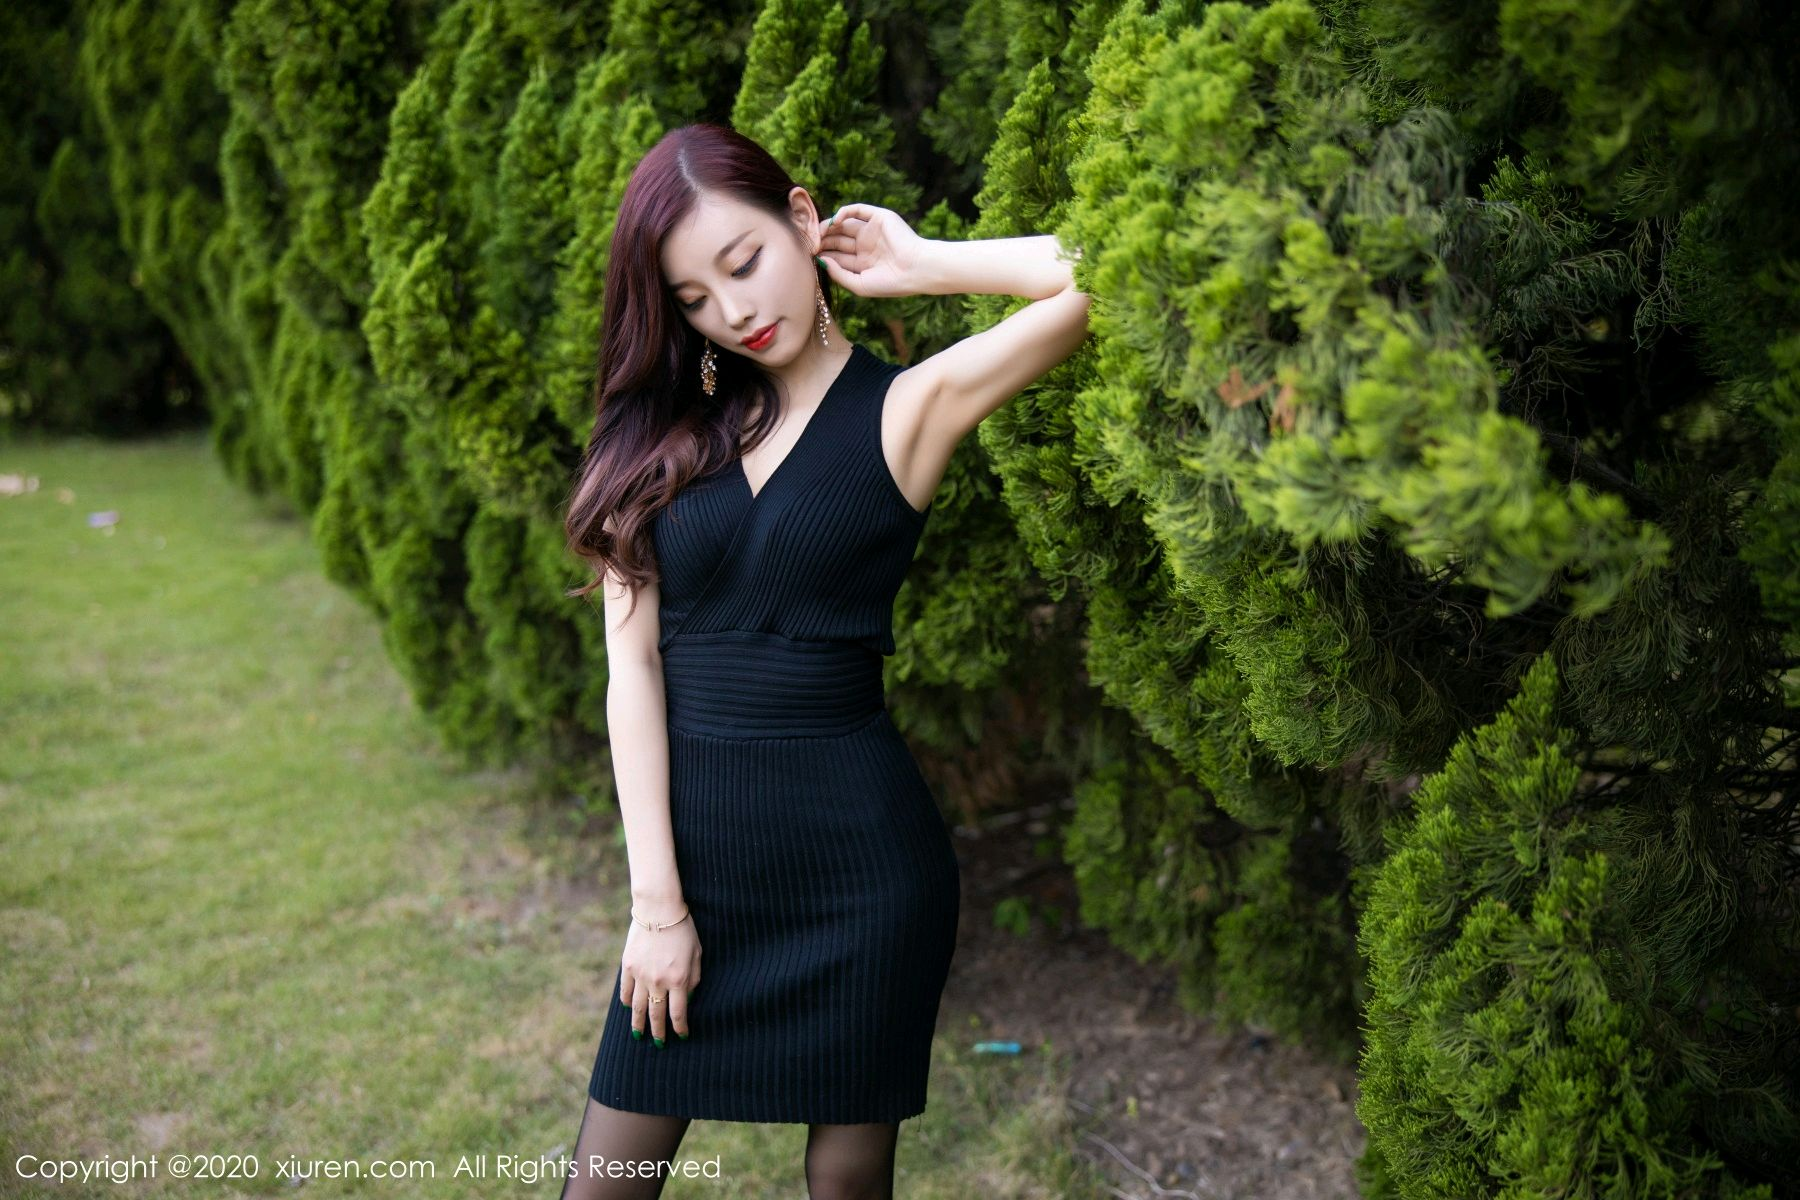 [XiuRen] Vol.2648 Yang Chen Chen 40P, Black Silk, Outdoor, Xiuren, Yang Chen Chen